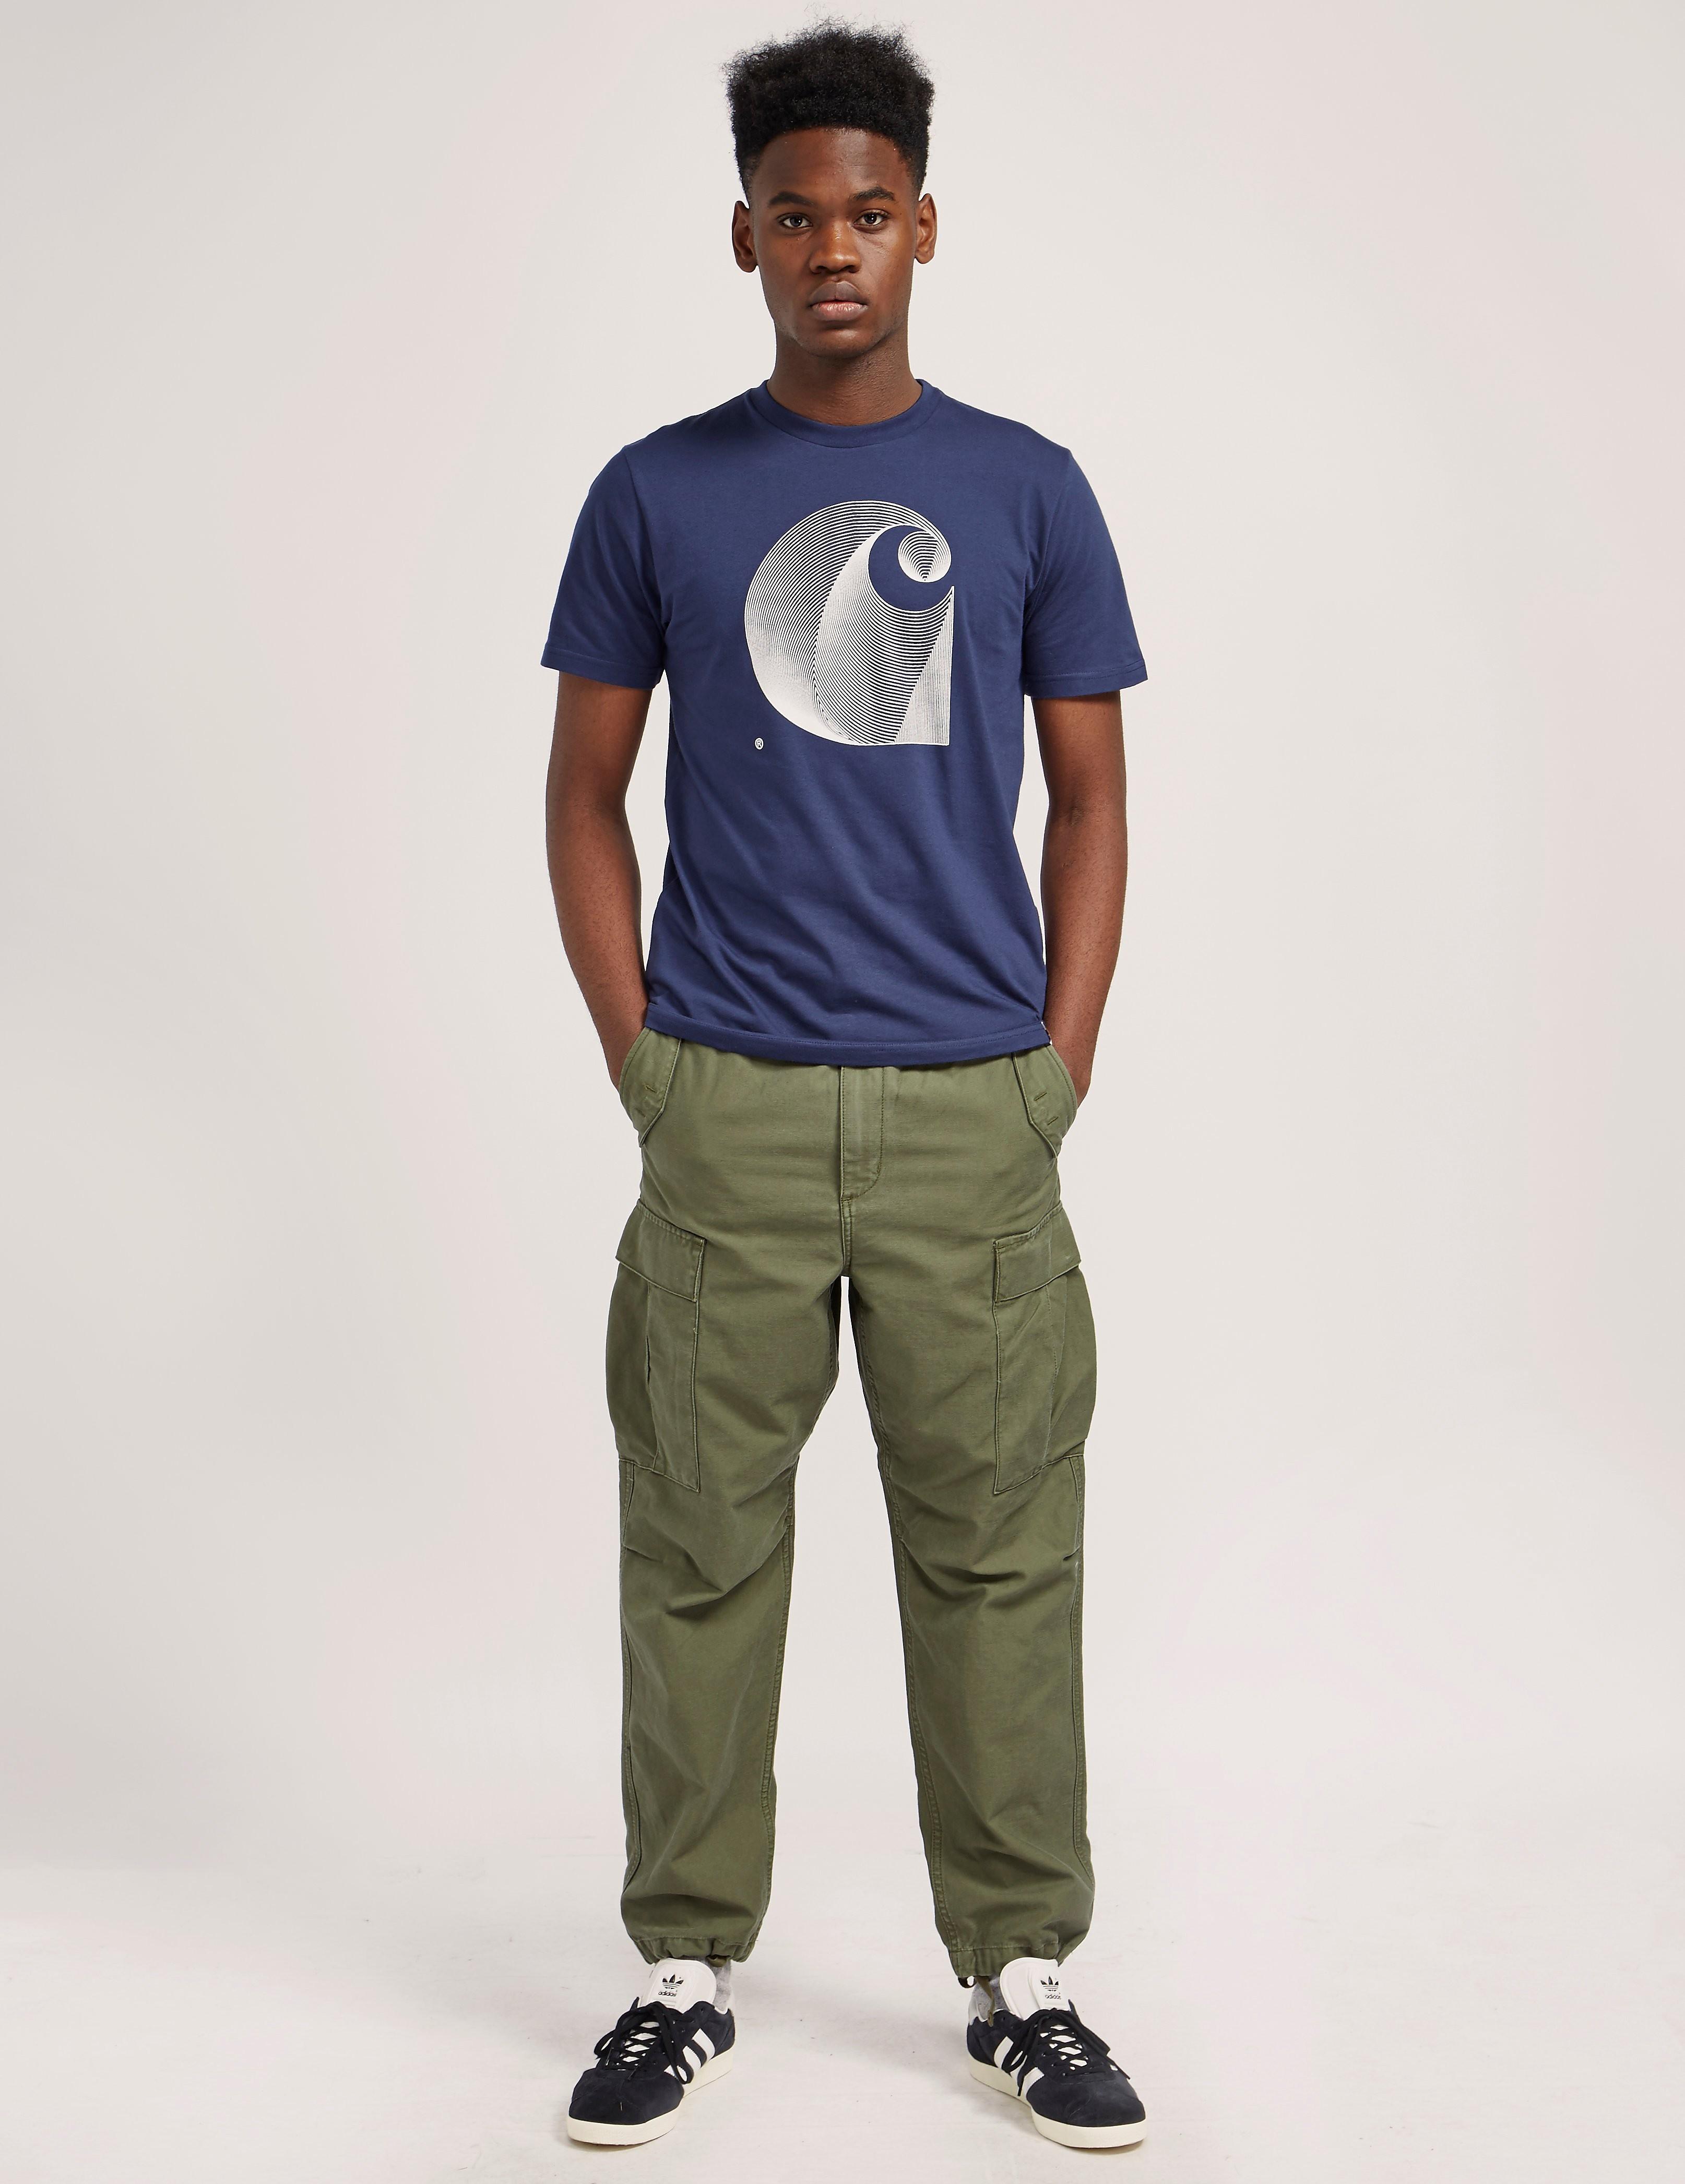 Carhartt WIP Dimensions Short Sleeve T-Shirt